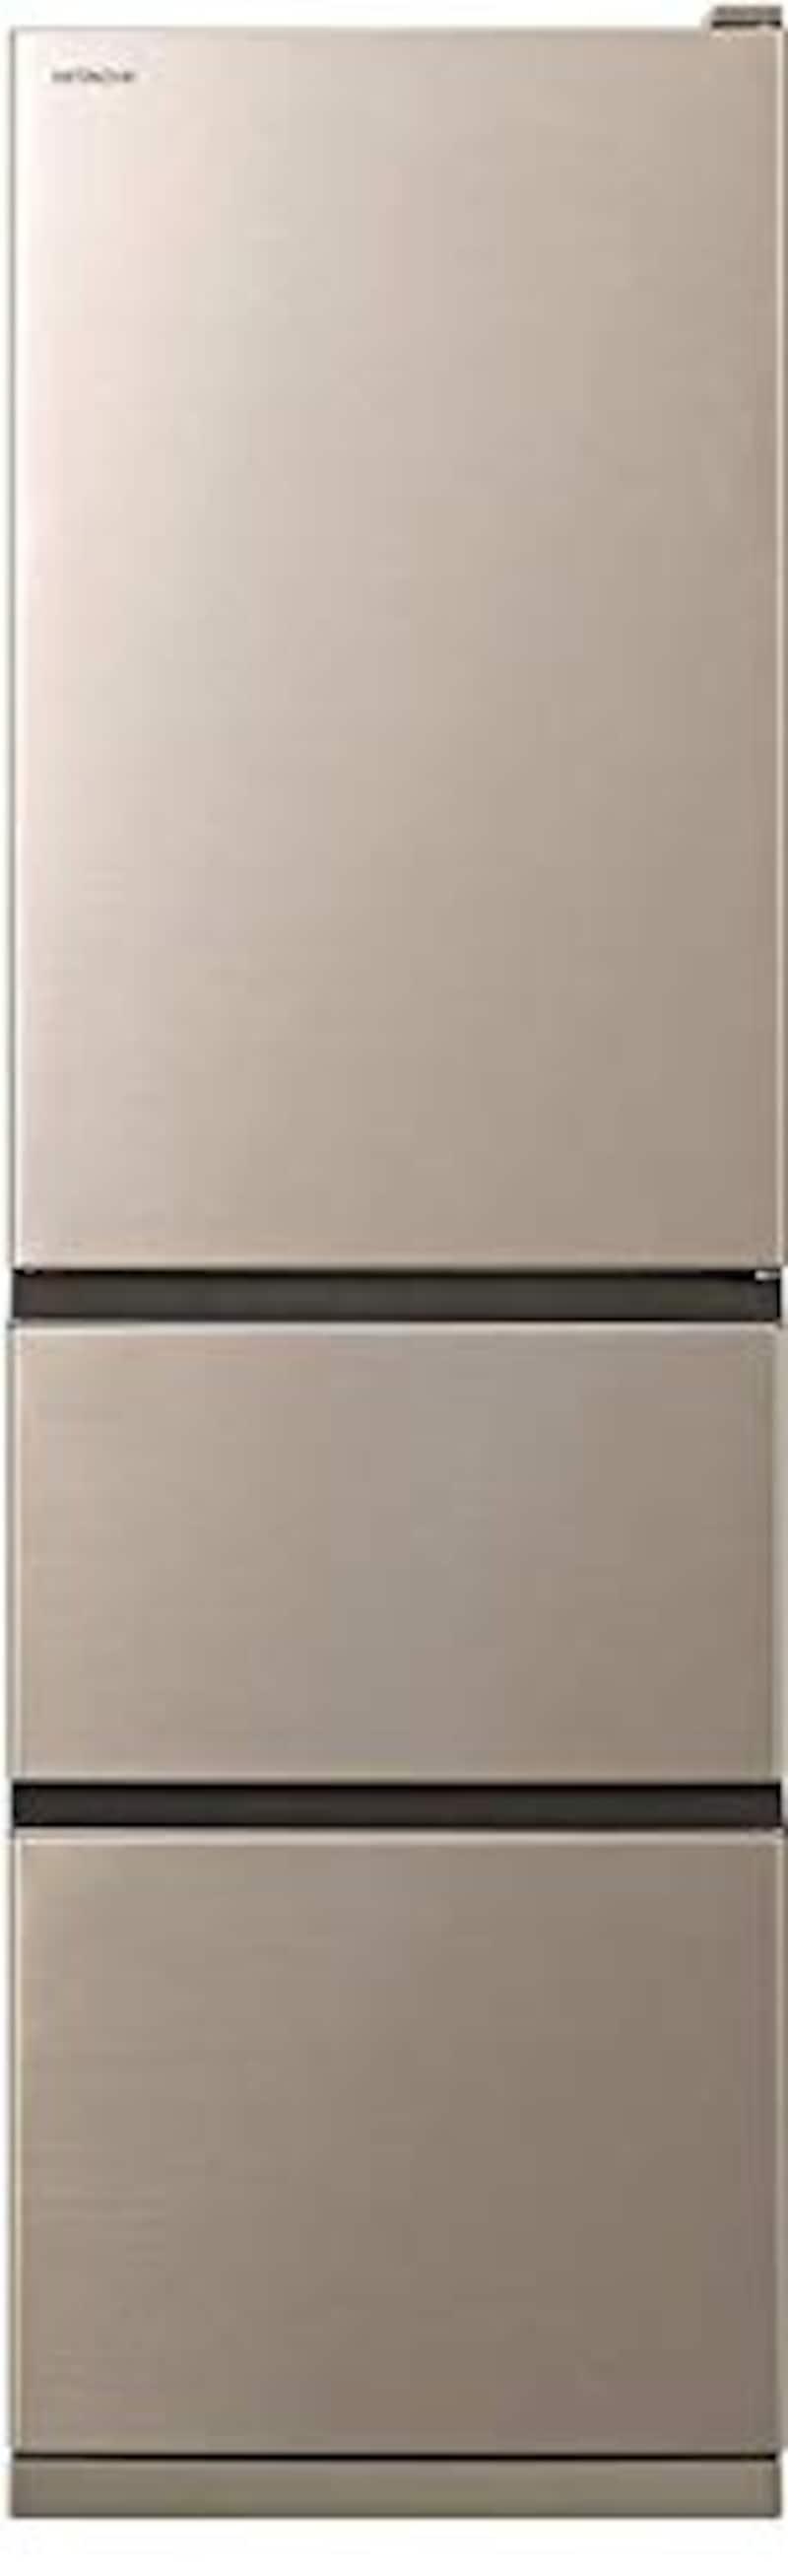 HITACHI(日立),冷蔵庫 Vタイプ,R-V32KVL